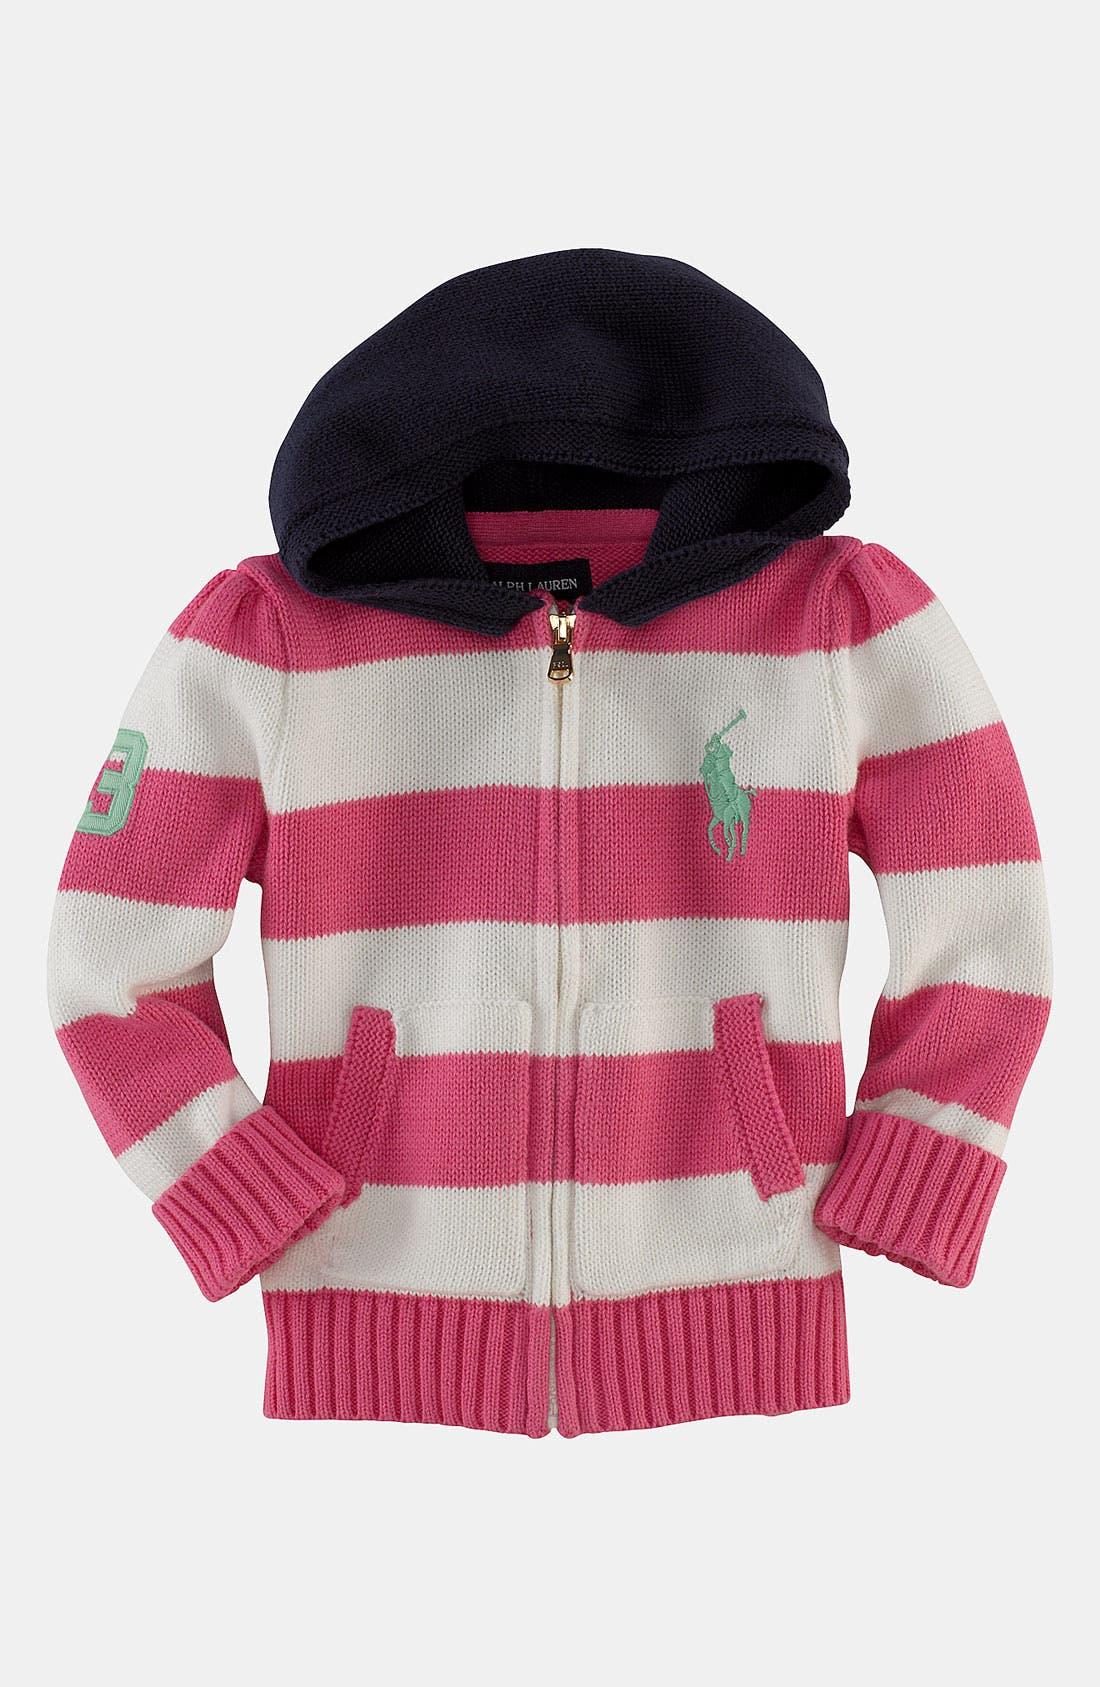 Alternate Image 1 Selected - Ralph Lauren Knit Hoodie (Infant)